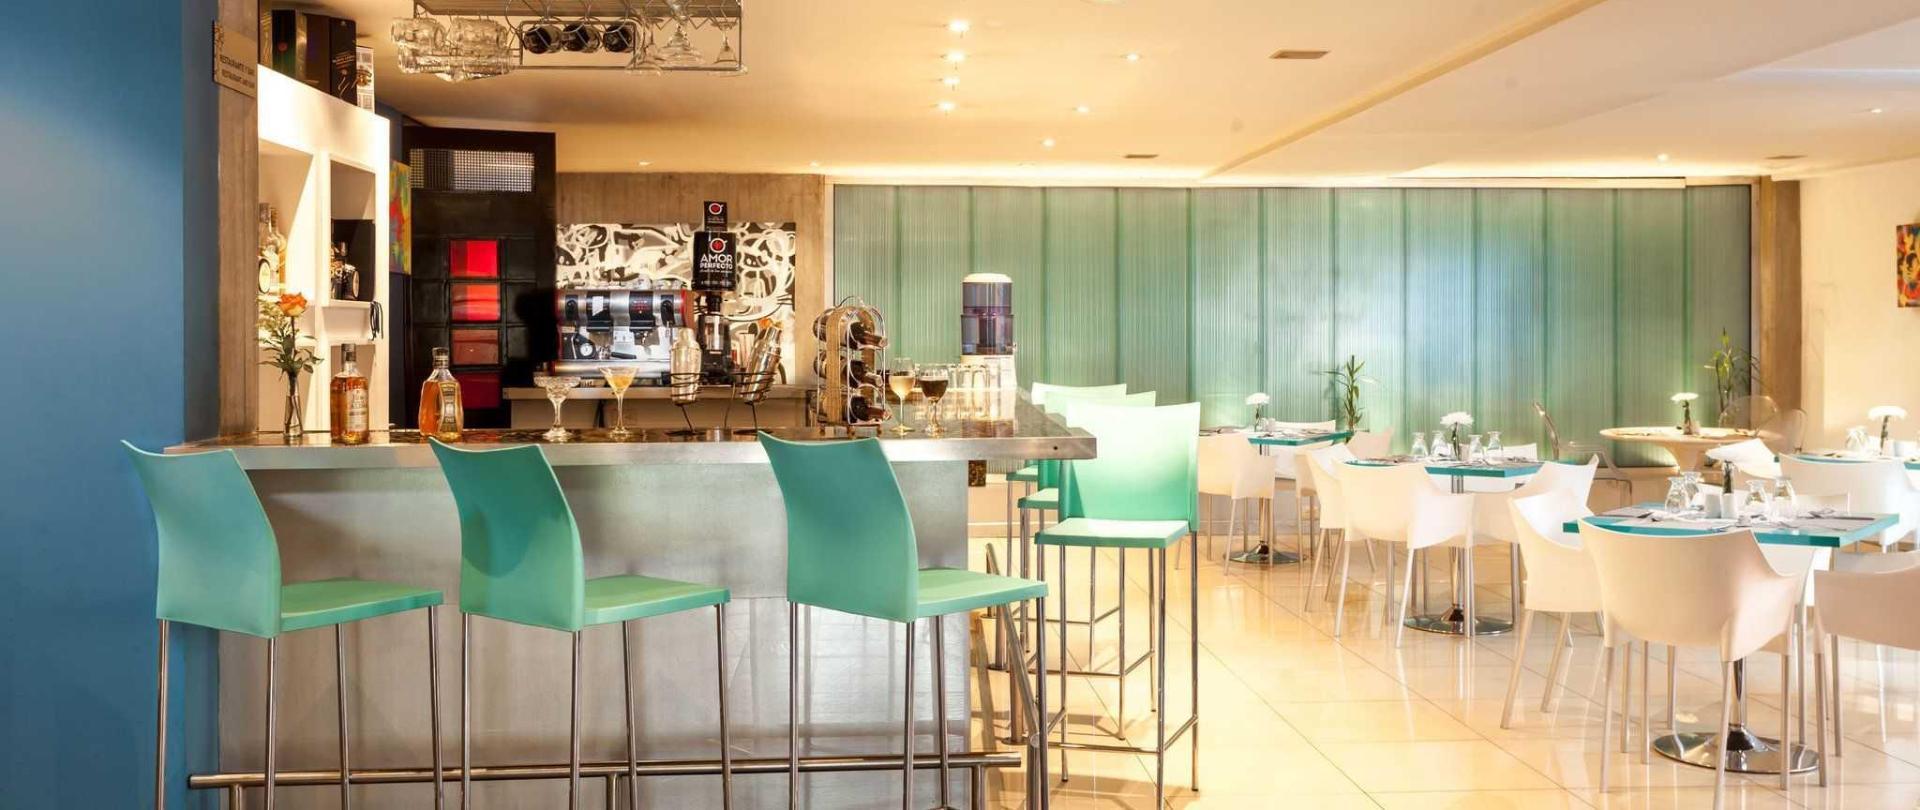 bar-restaurante-1.jpg